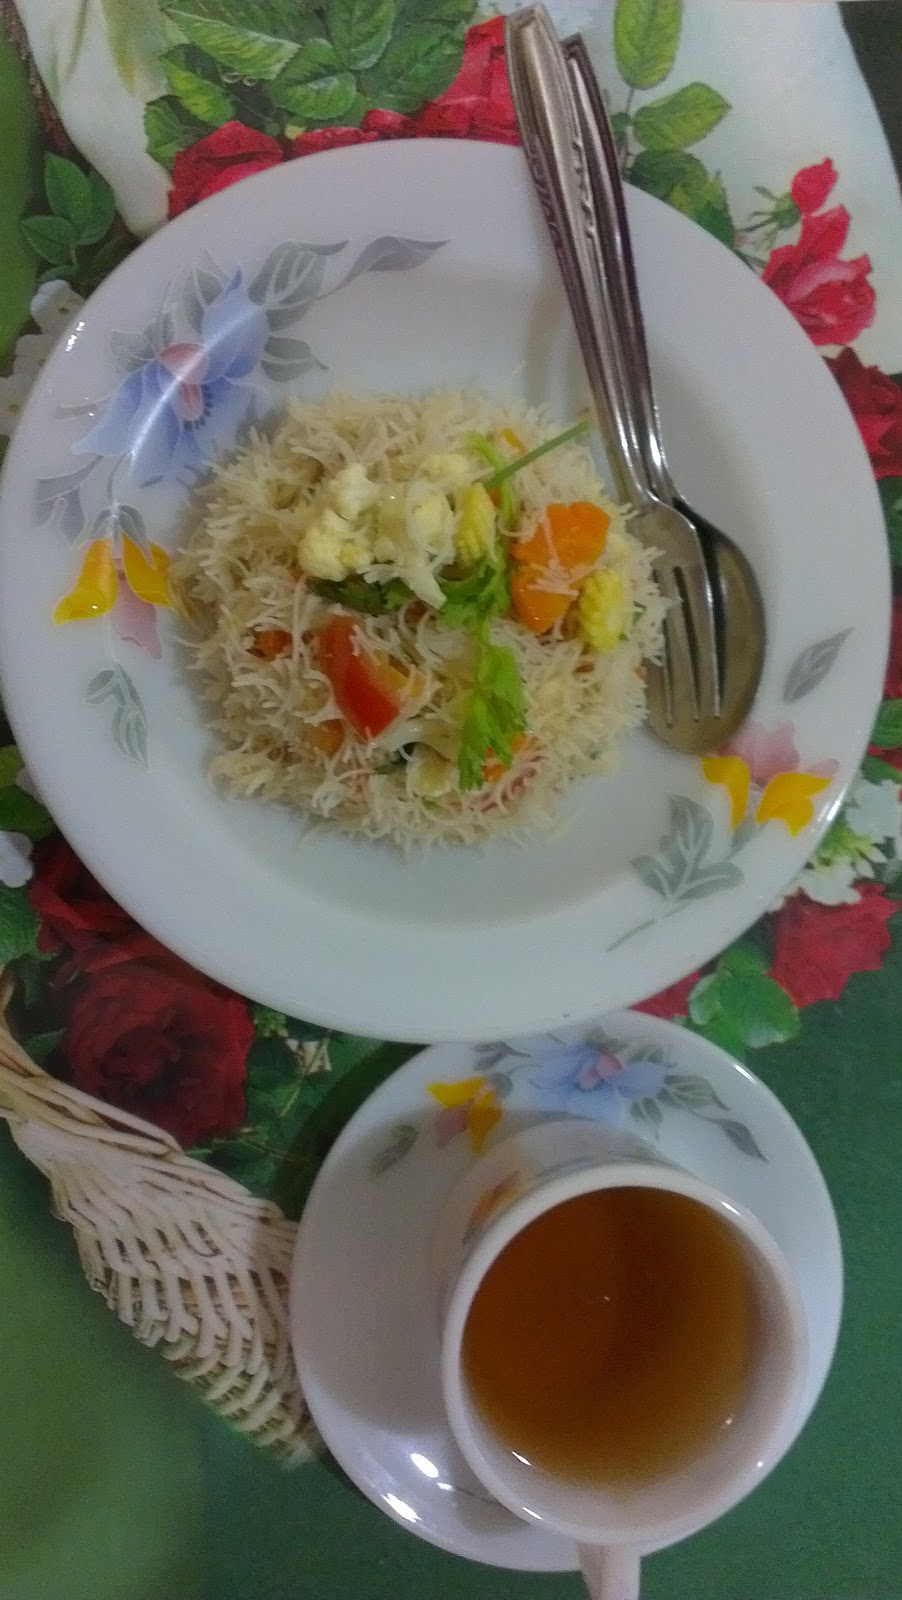 CAHAYA HIDUPKU: Mee Hoon Goreng Sayur Rampai ;-)